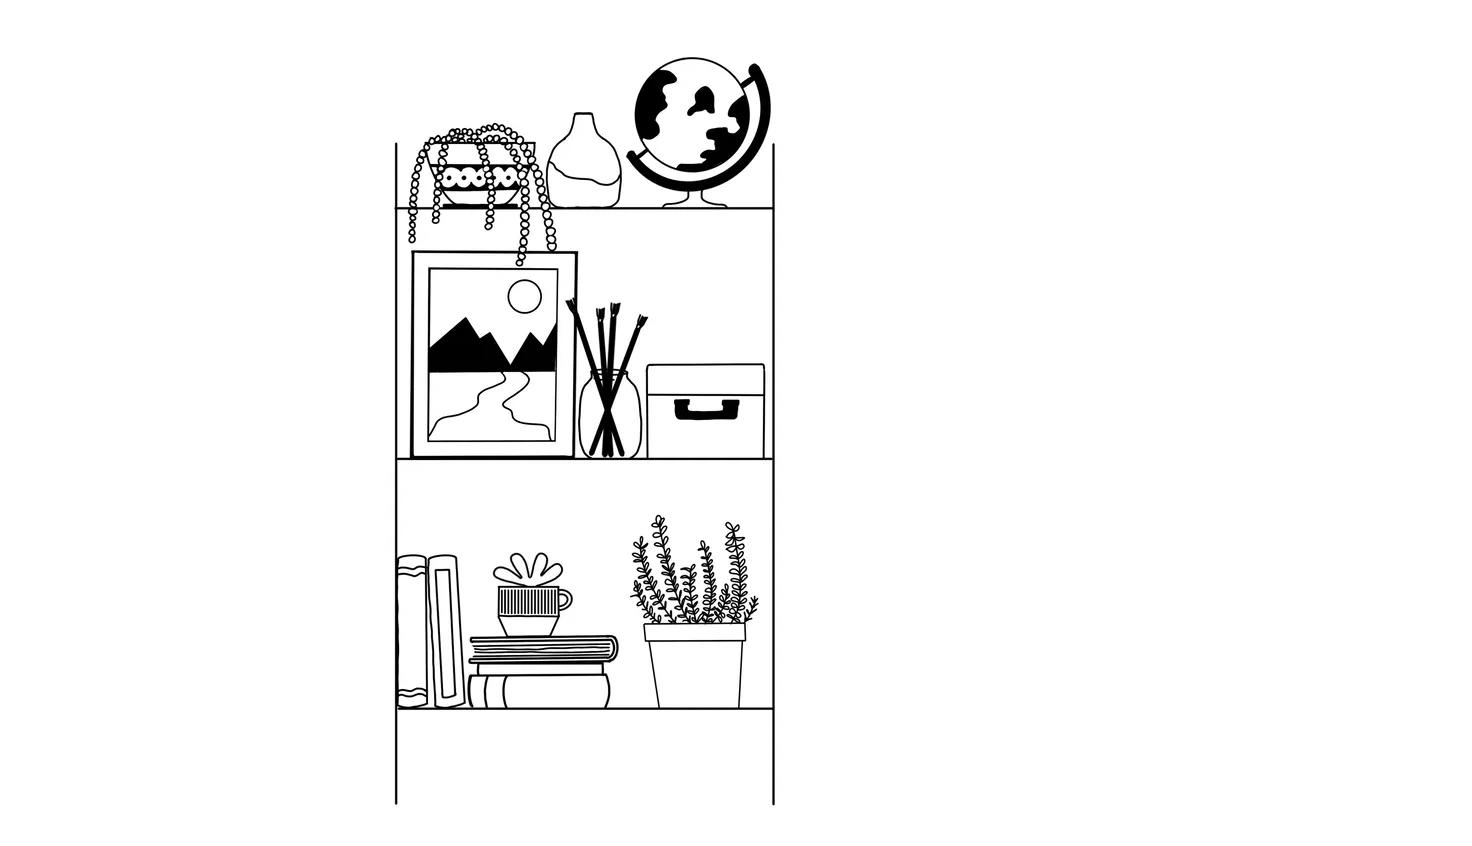 bookshelf drawing ideas for beginners